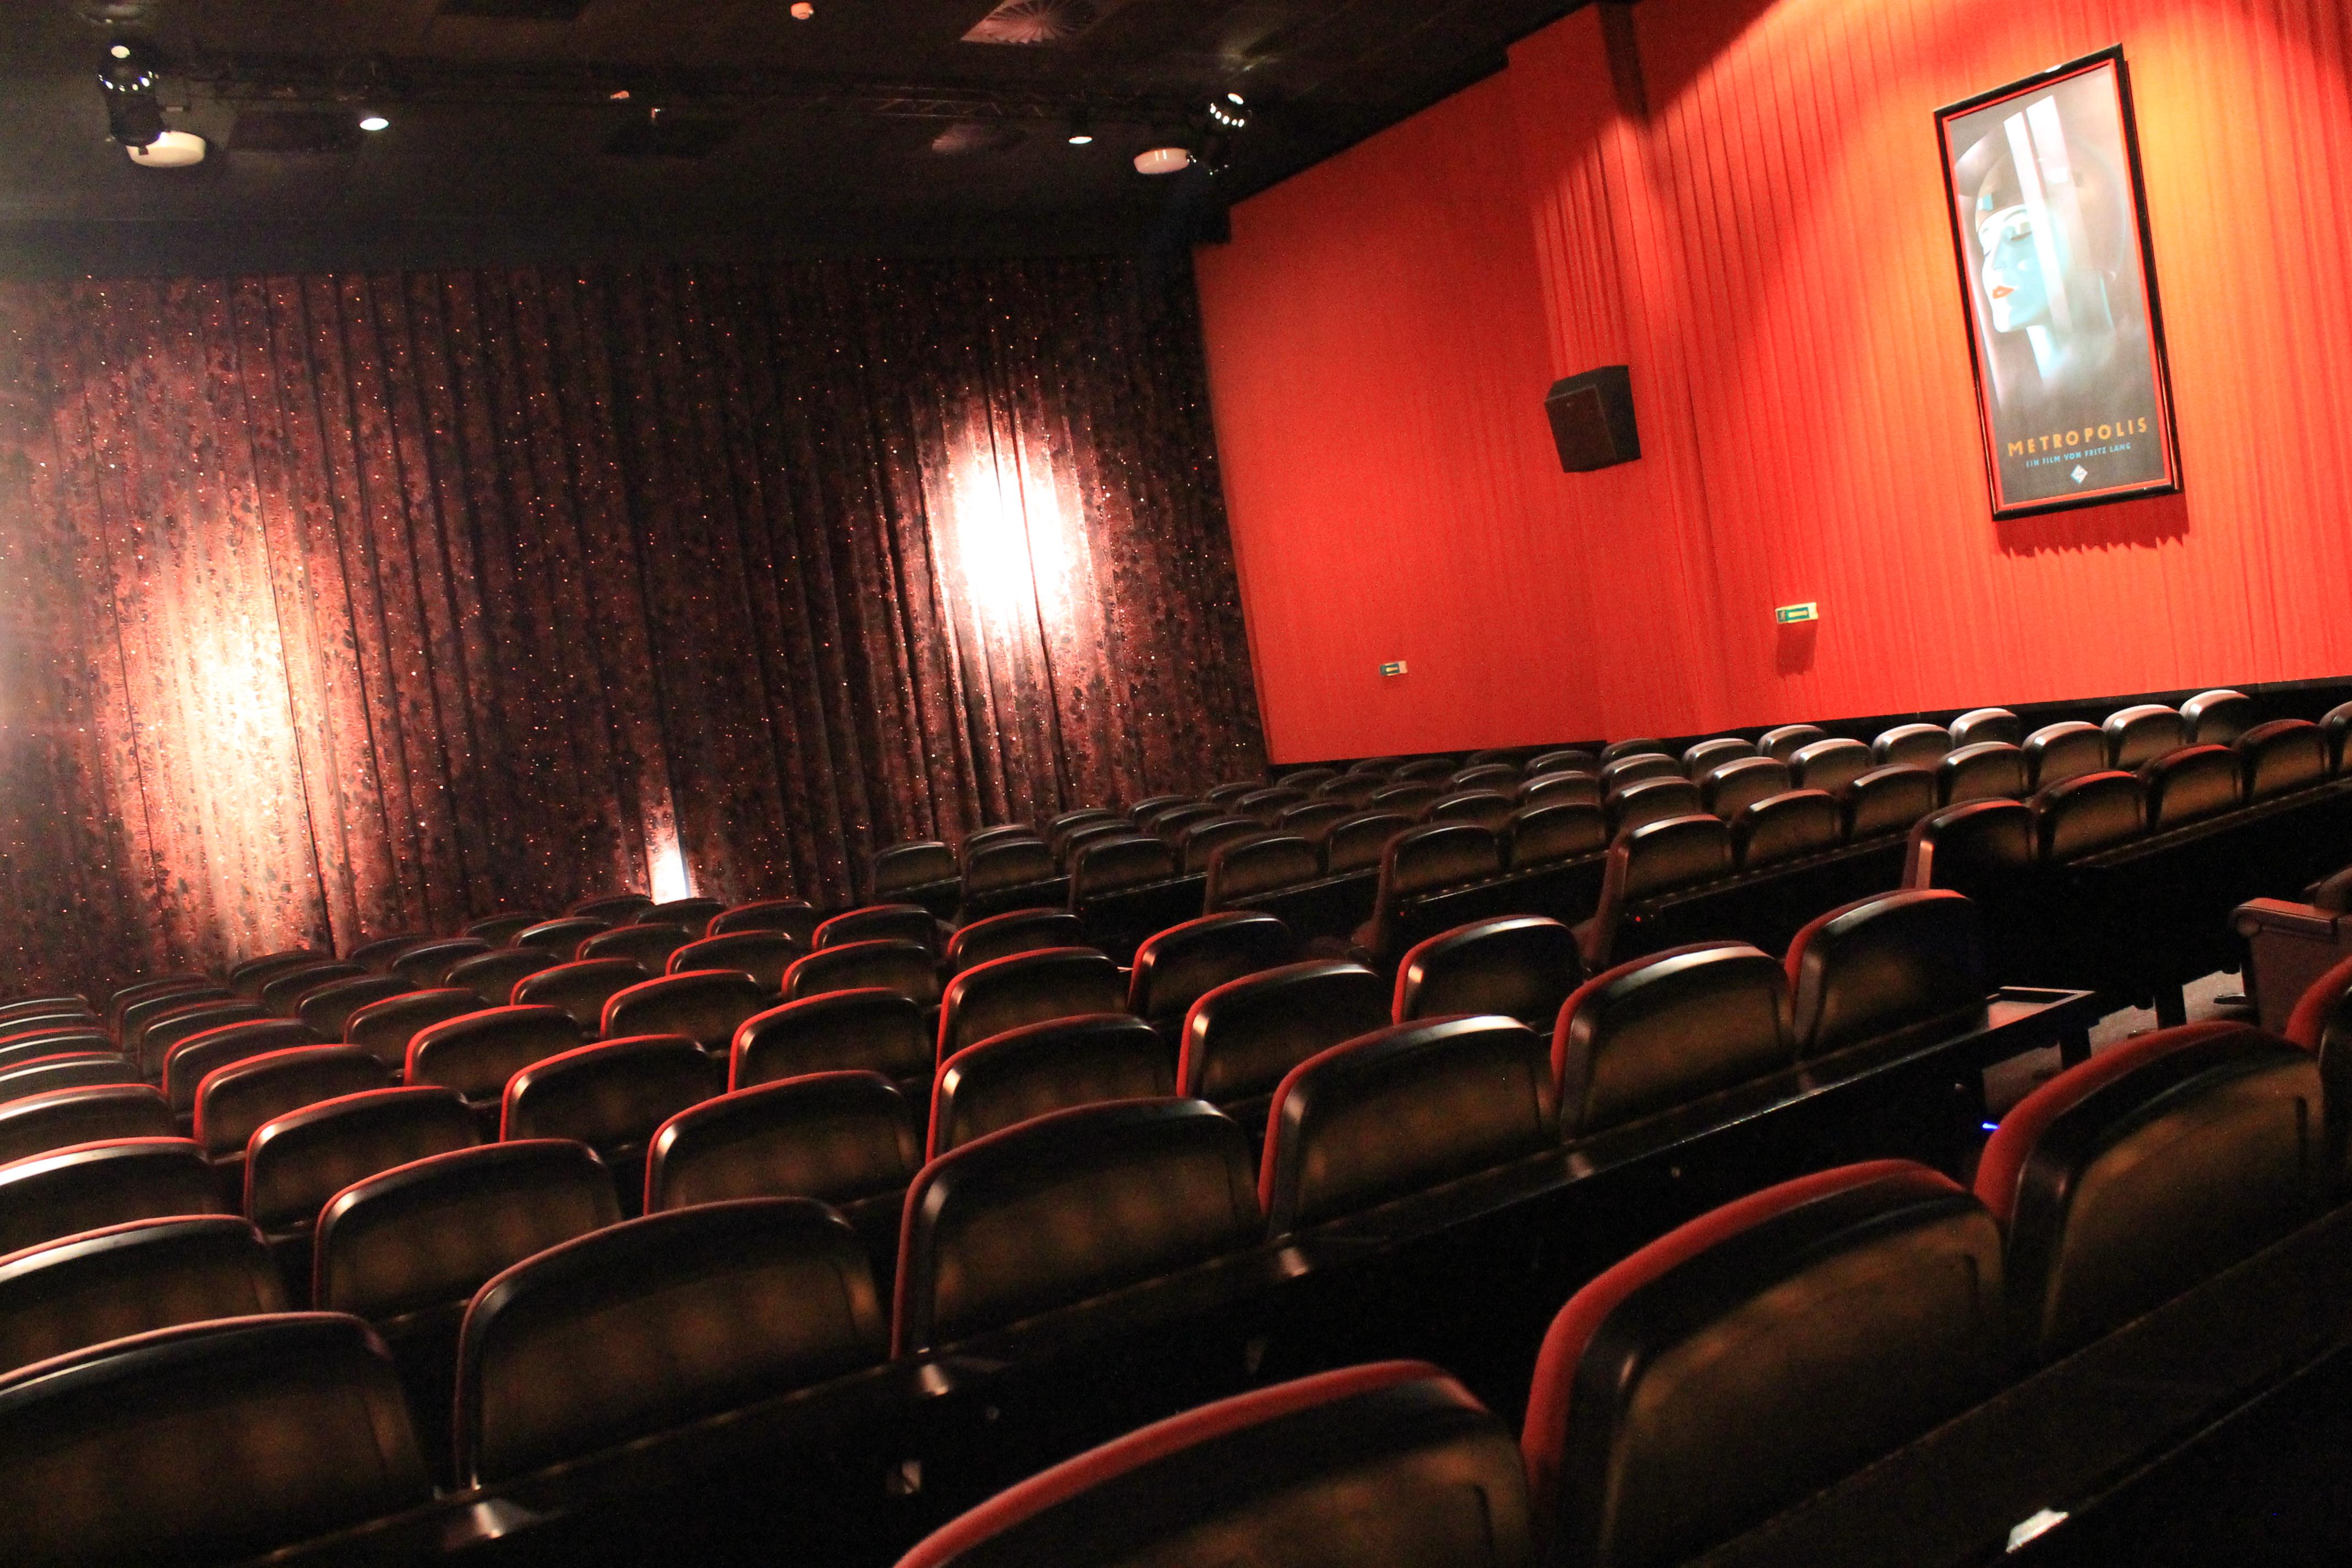 buchholz kino